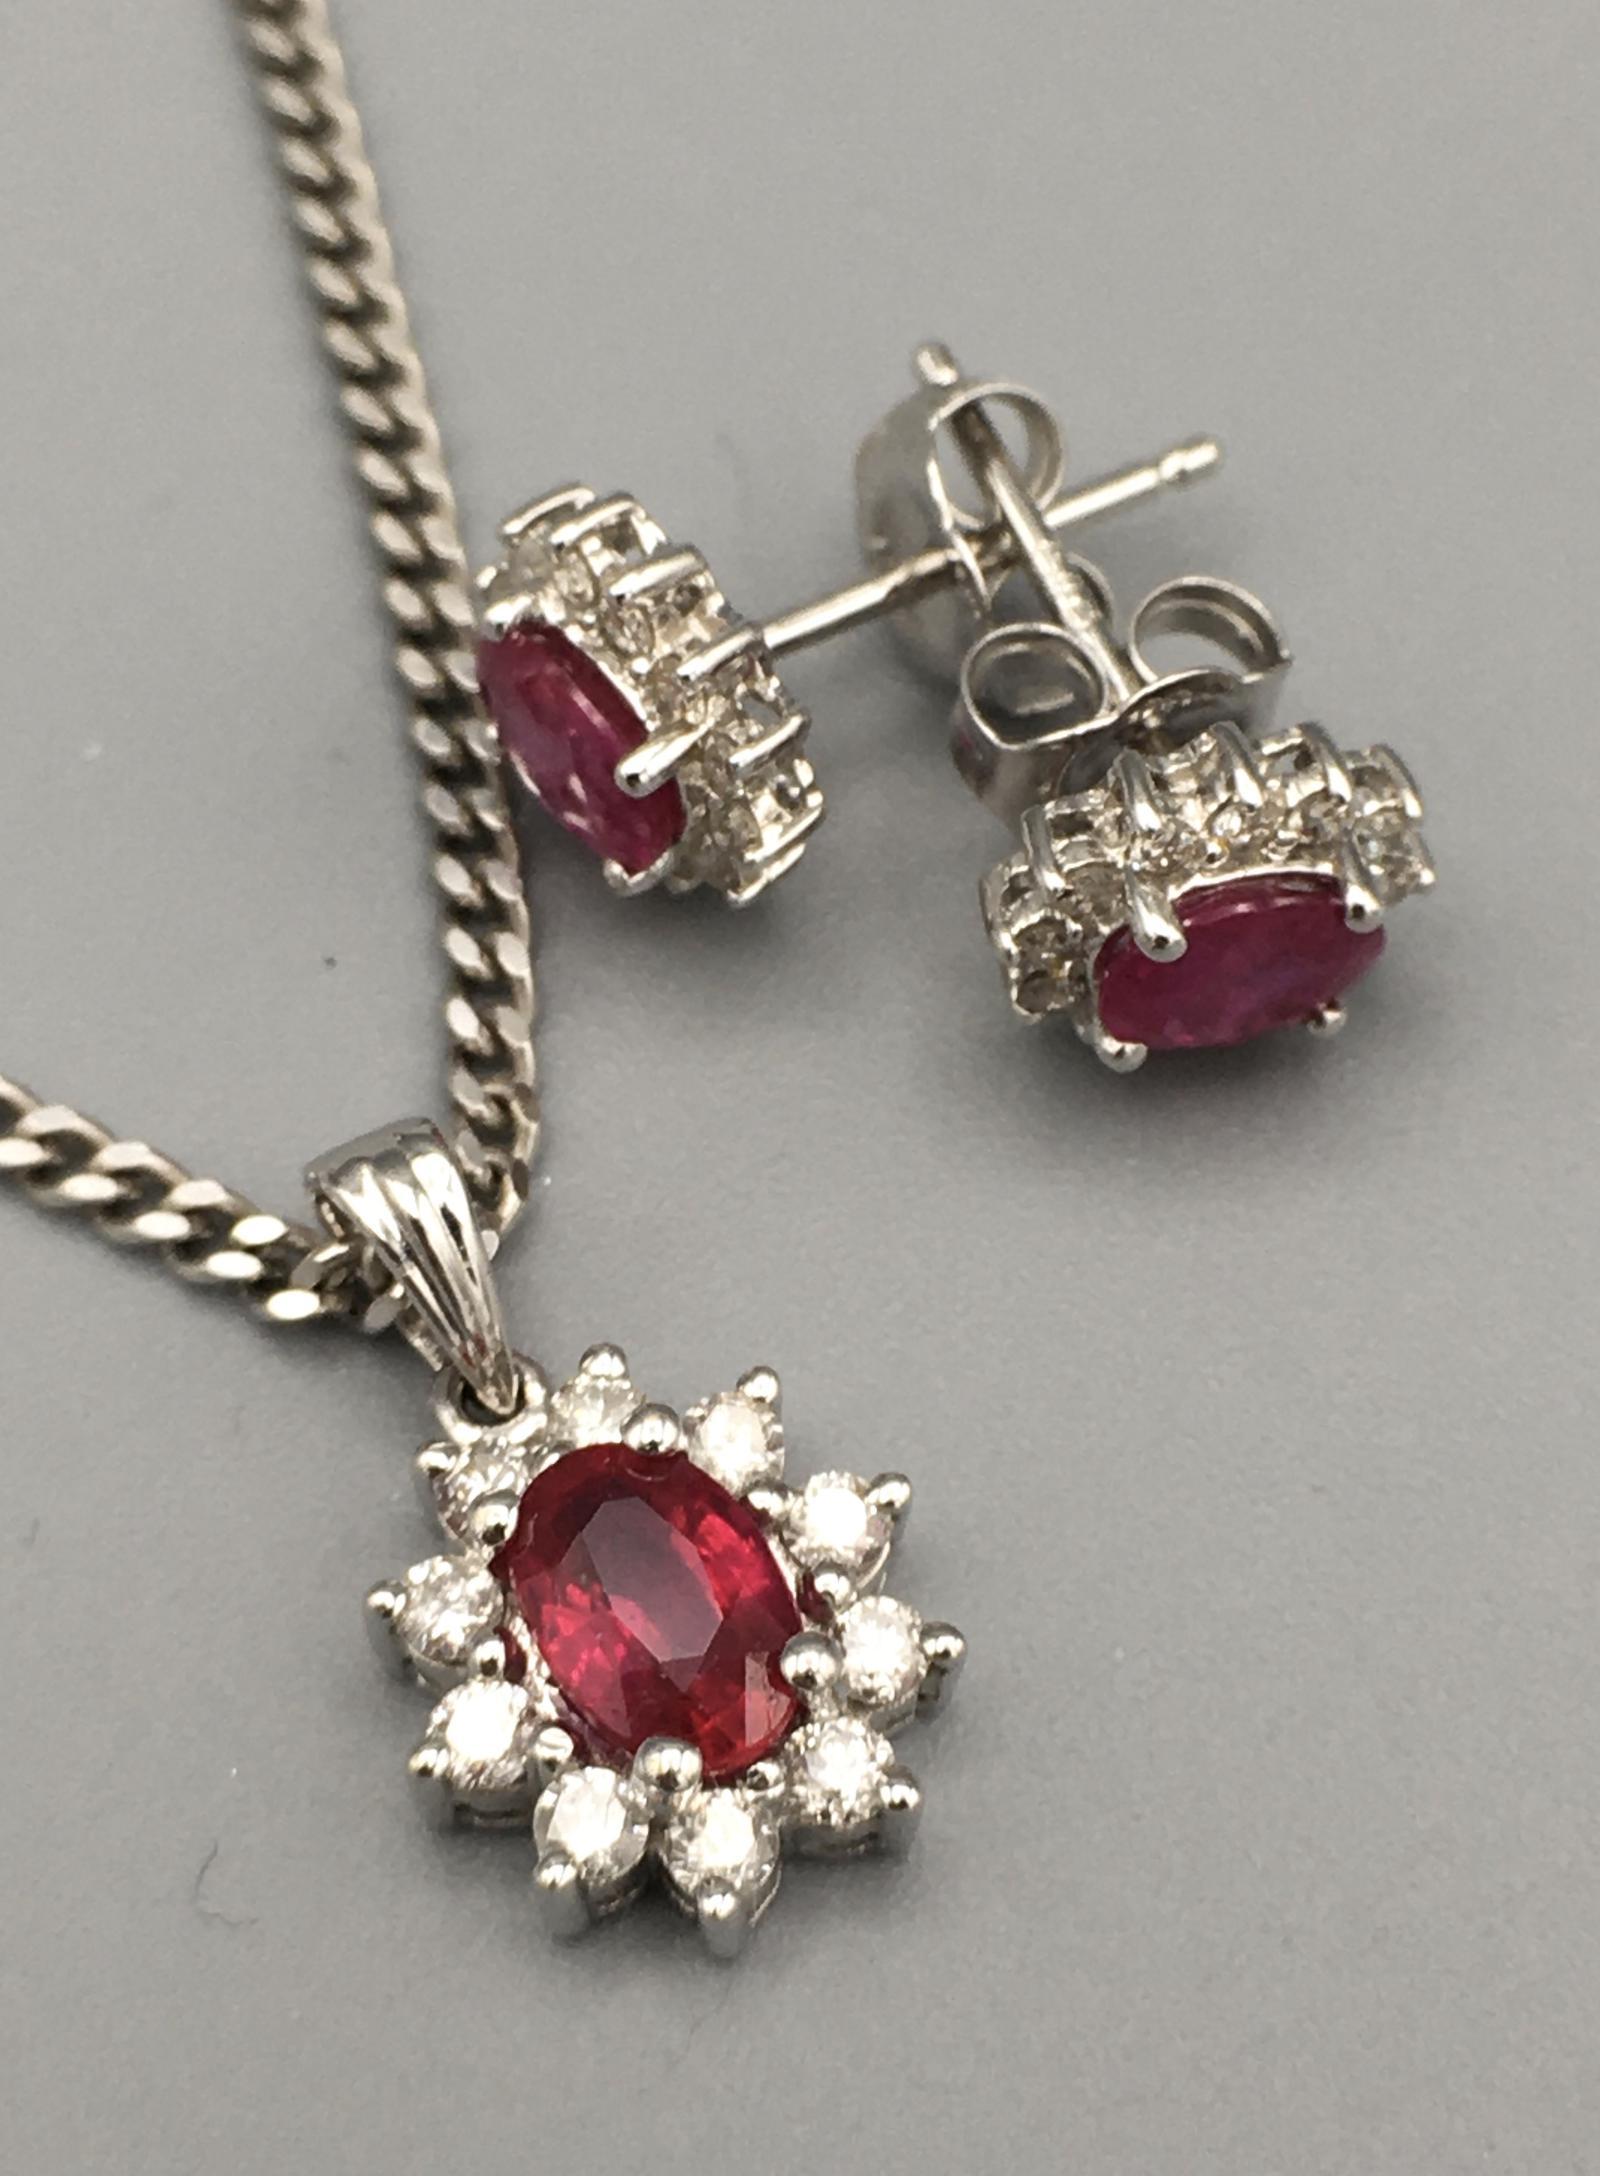 Teresa Brill Jewellery Ltd image (1 of 4)